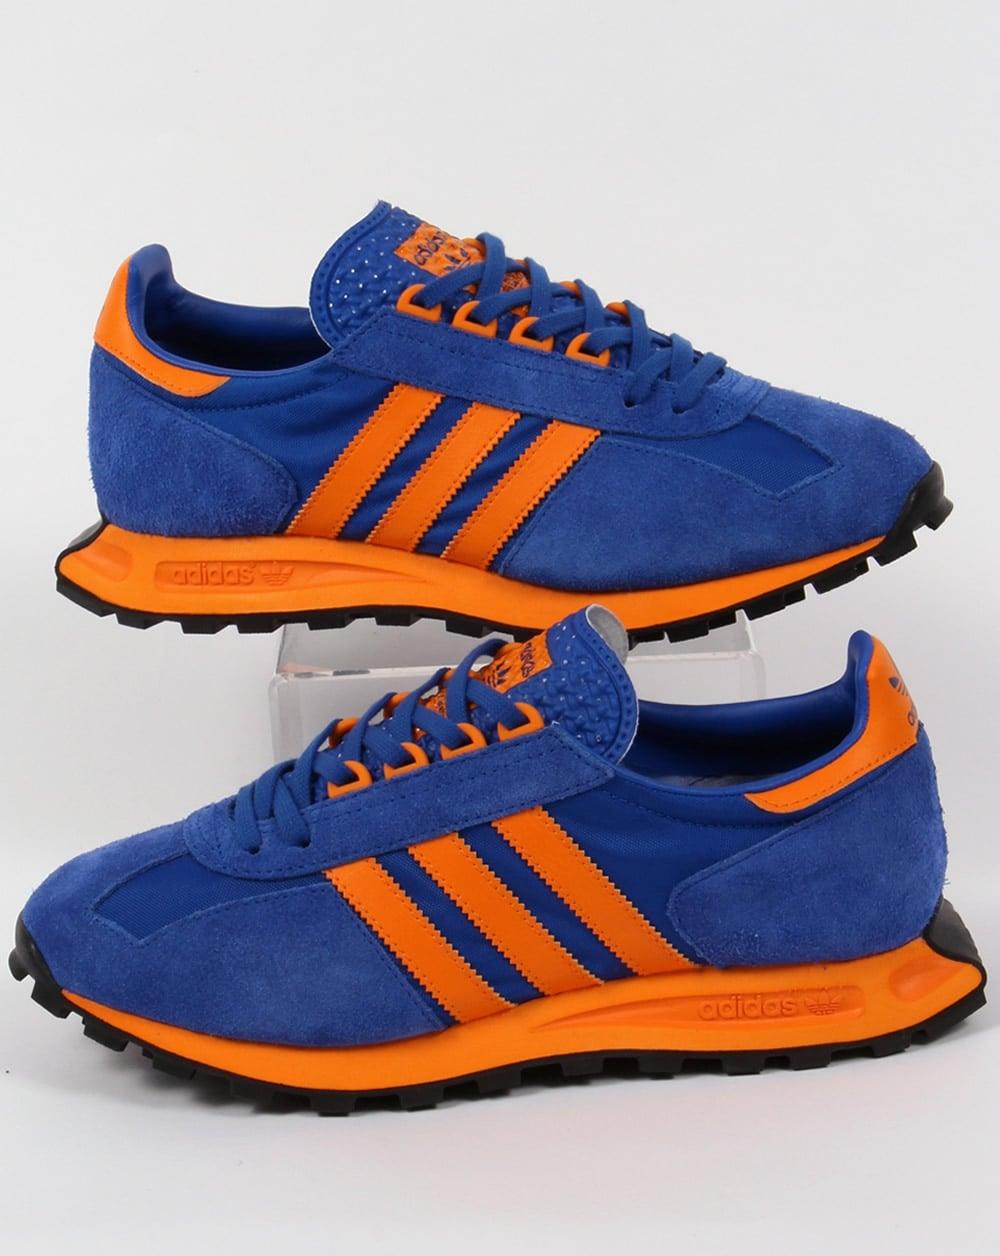 adidas formel 1 formatori potere blue / orange, originali, 2016, scarpe